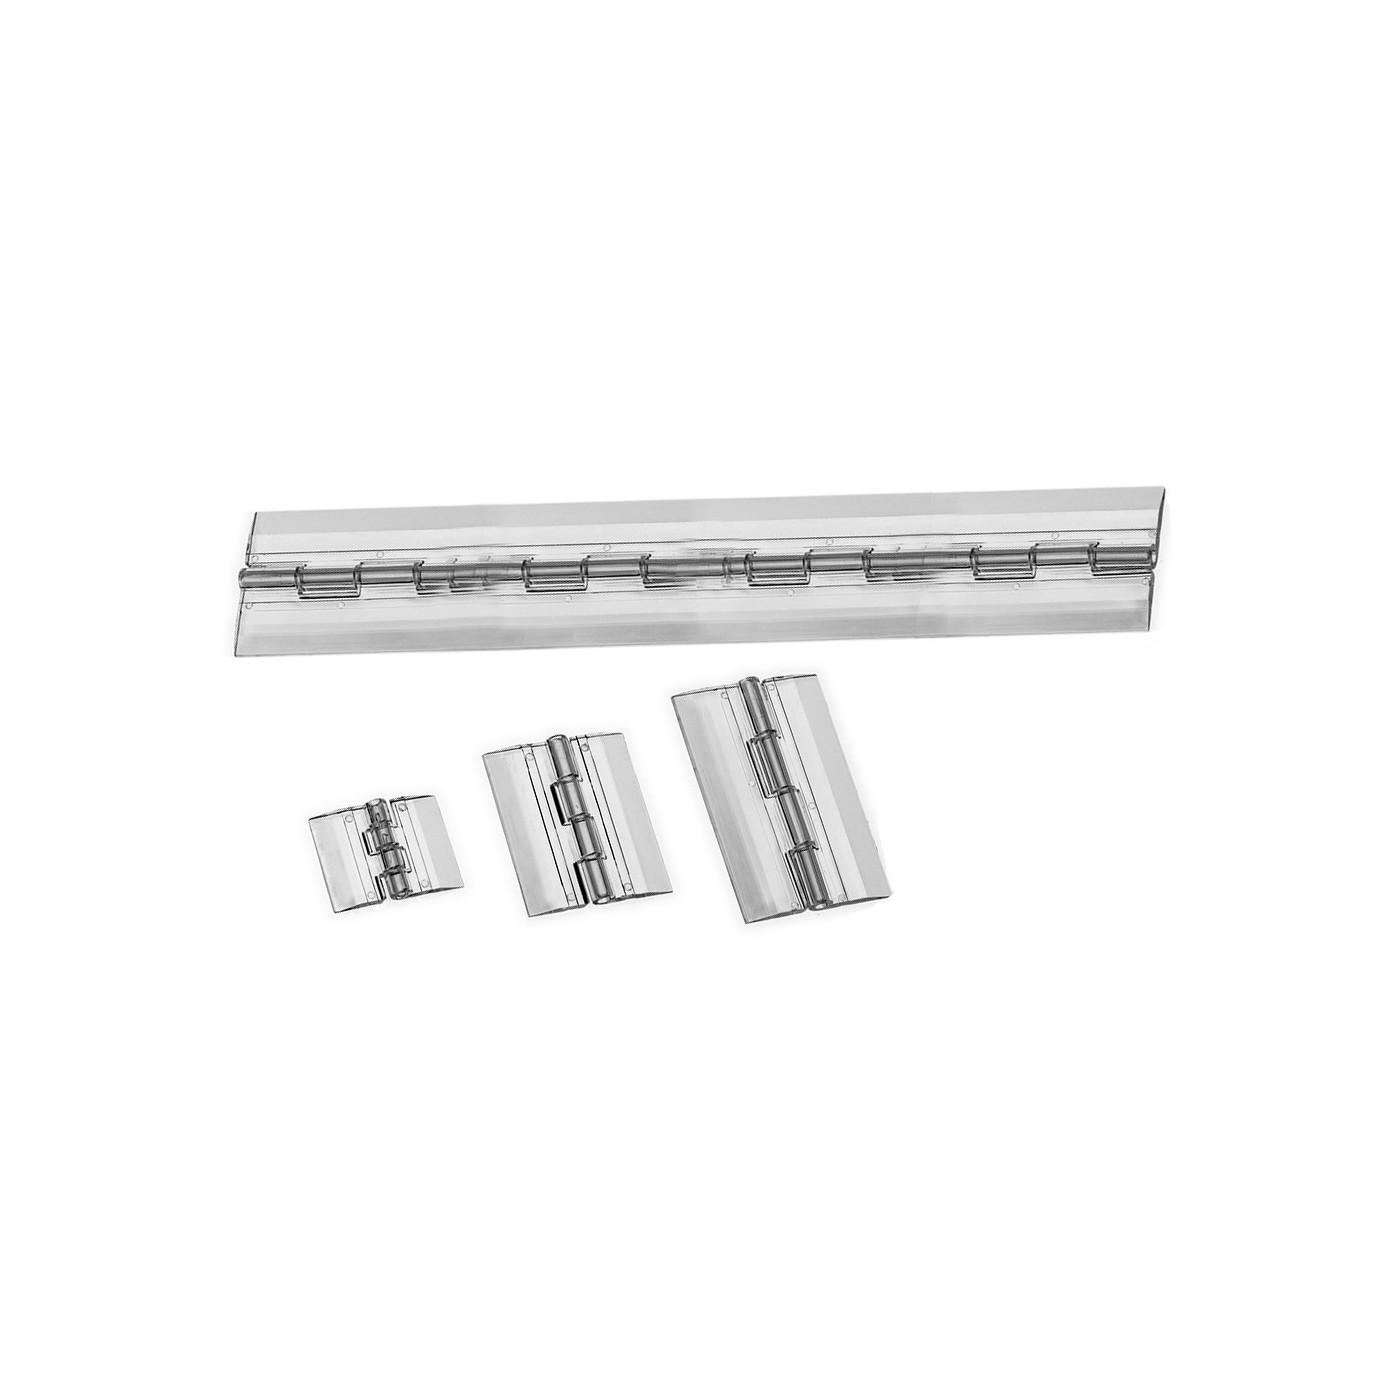 Set of 2 plastic hinges, transparent, 300x45 mm